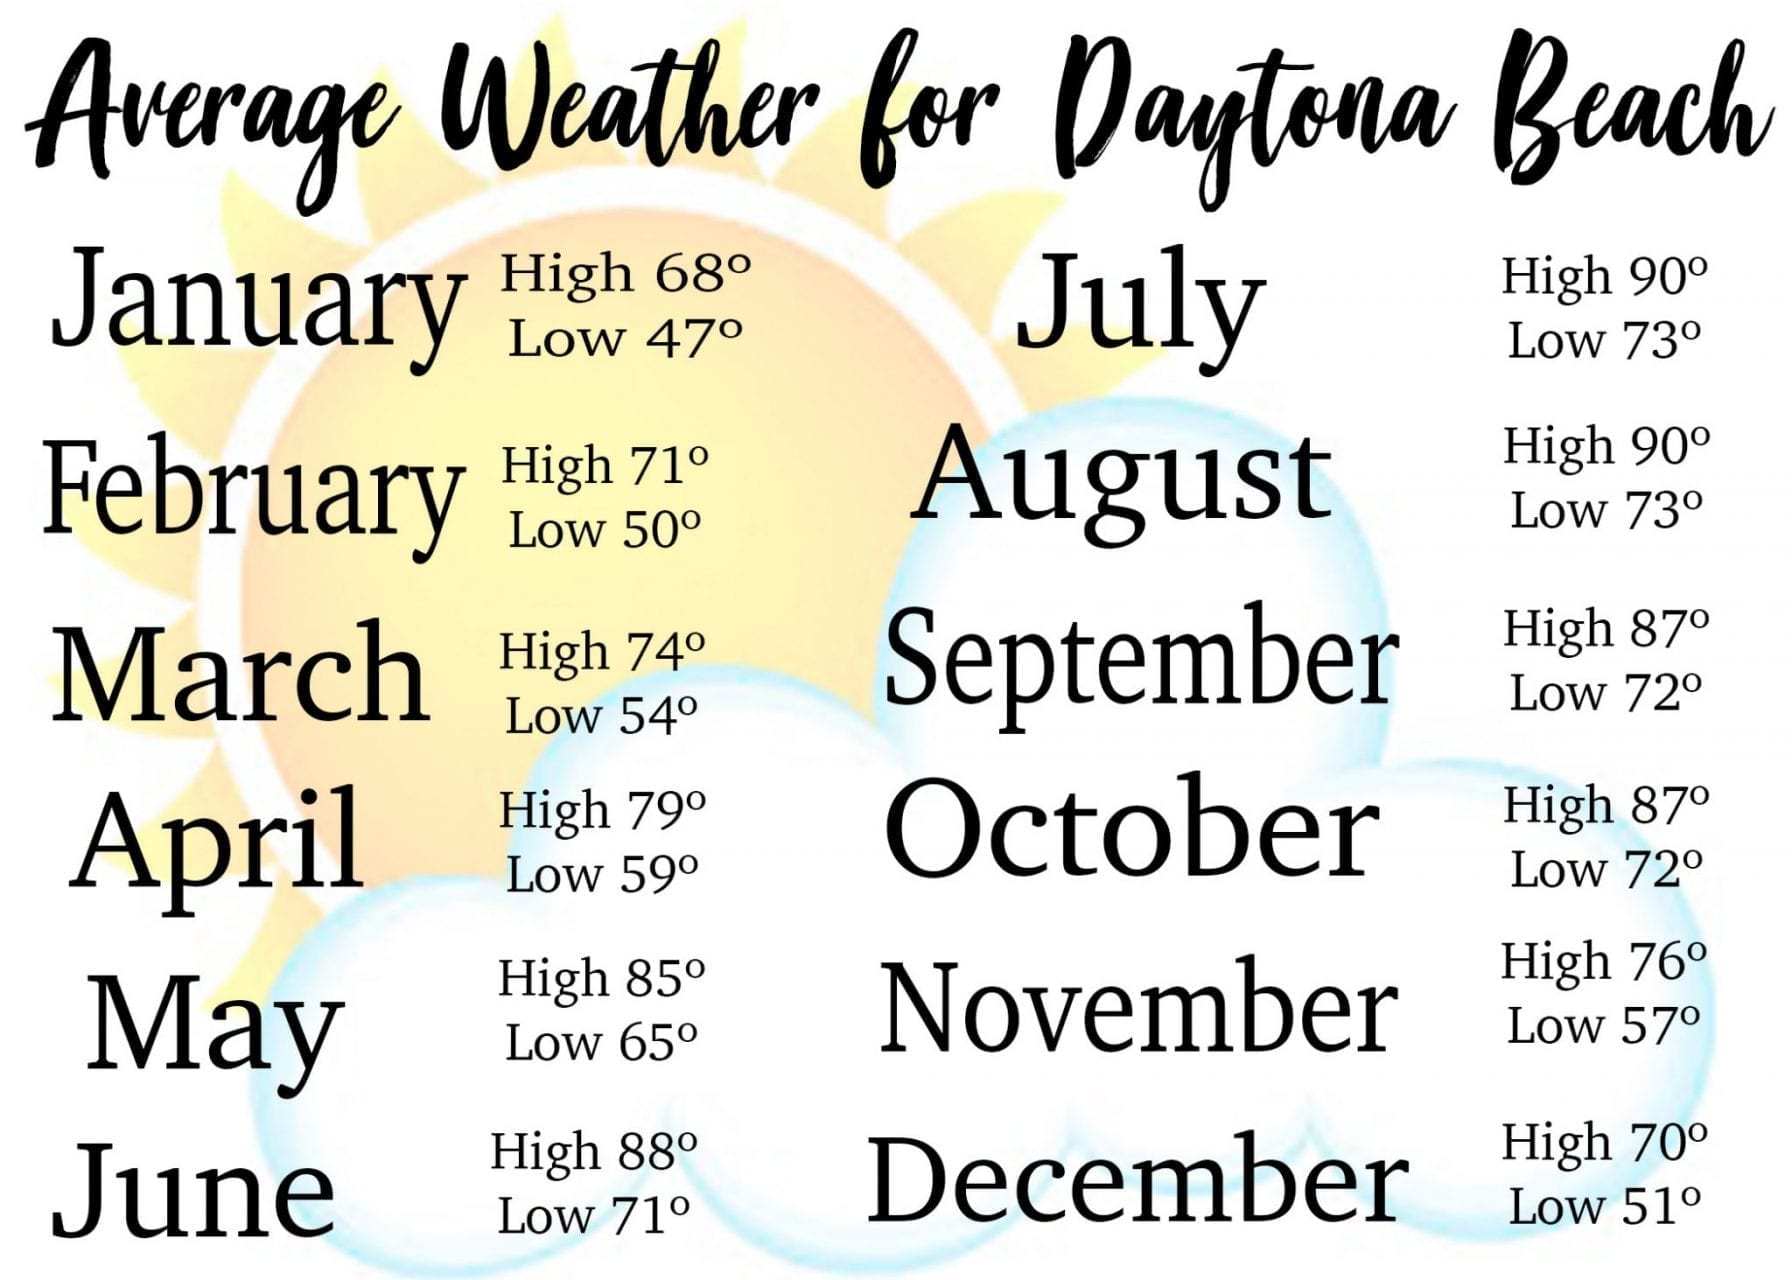 Daytona Beach average weather temperatures